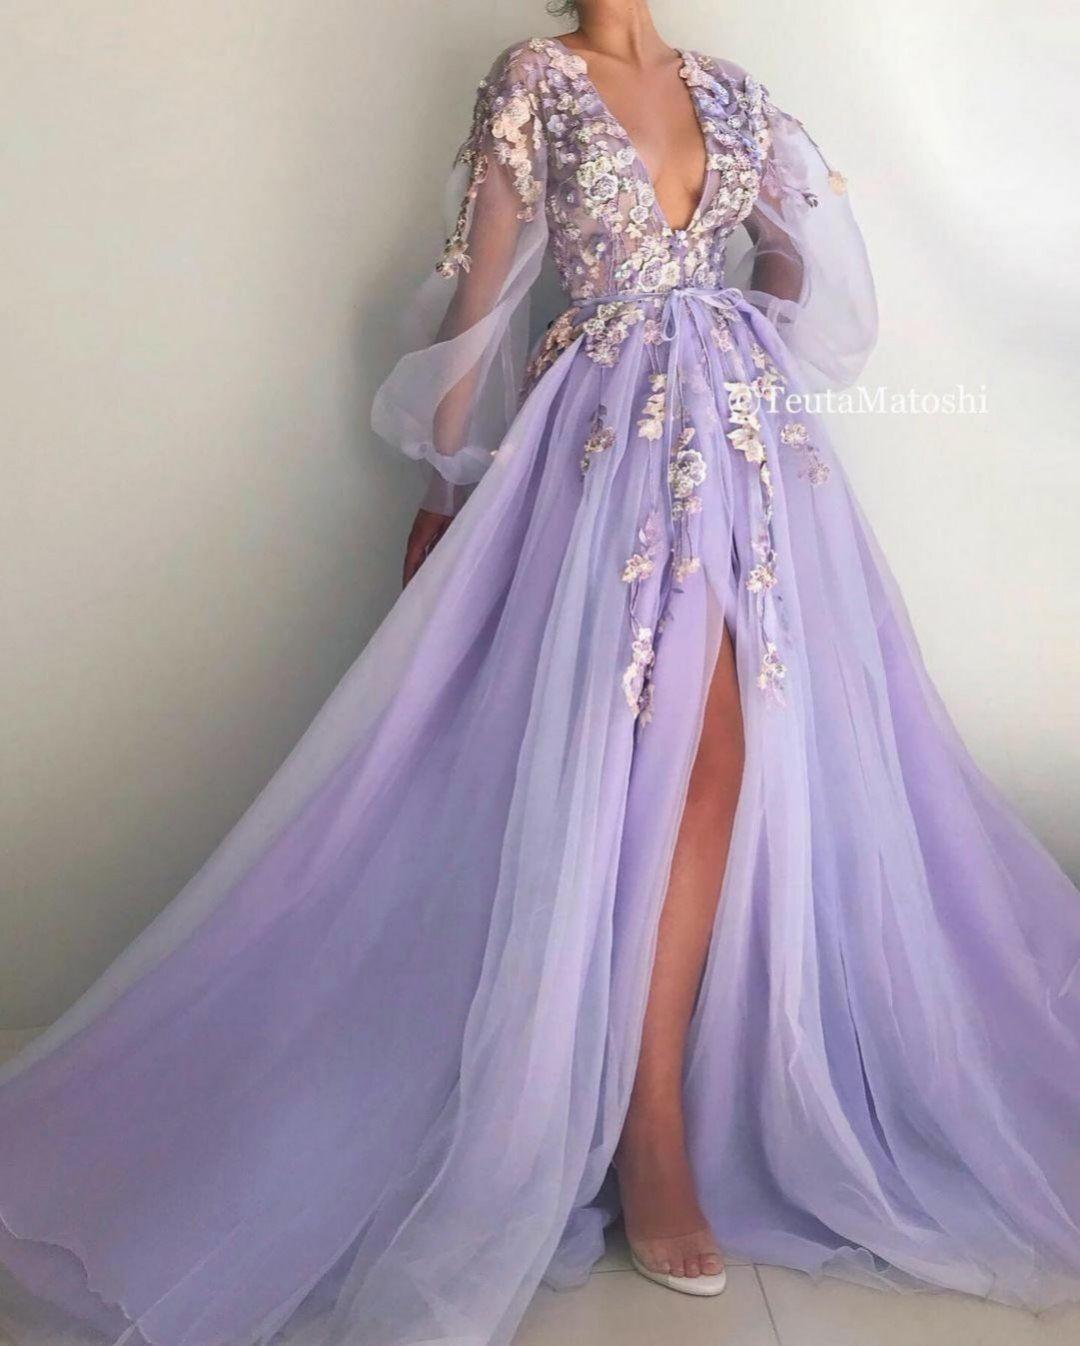 details - lila, lila kleid, farbe - organdy kleid stoff